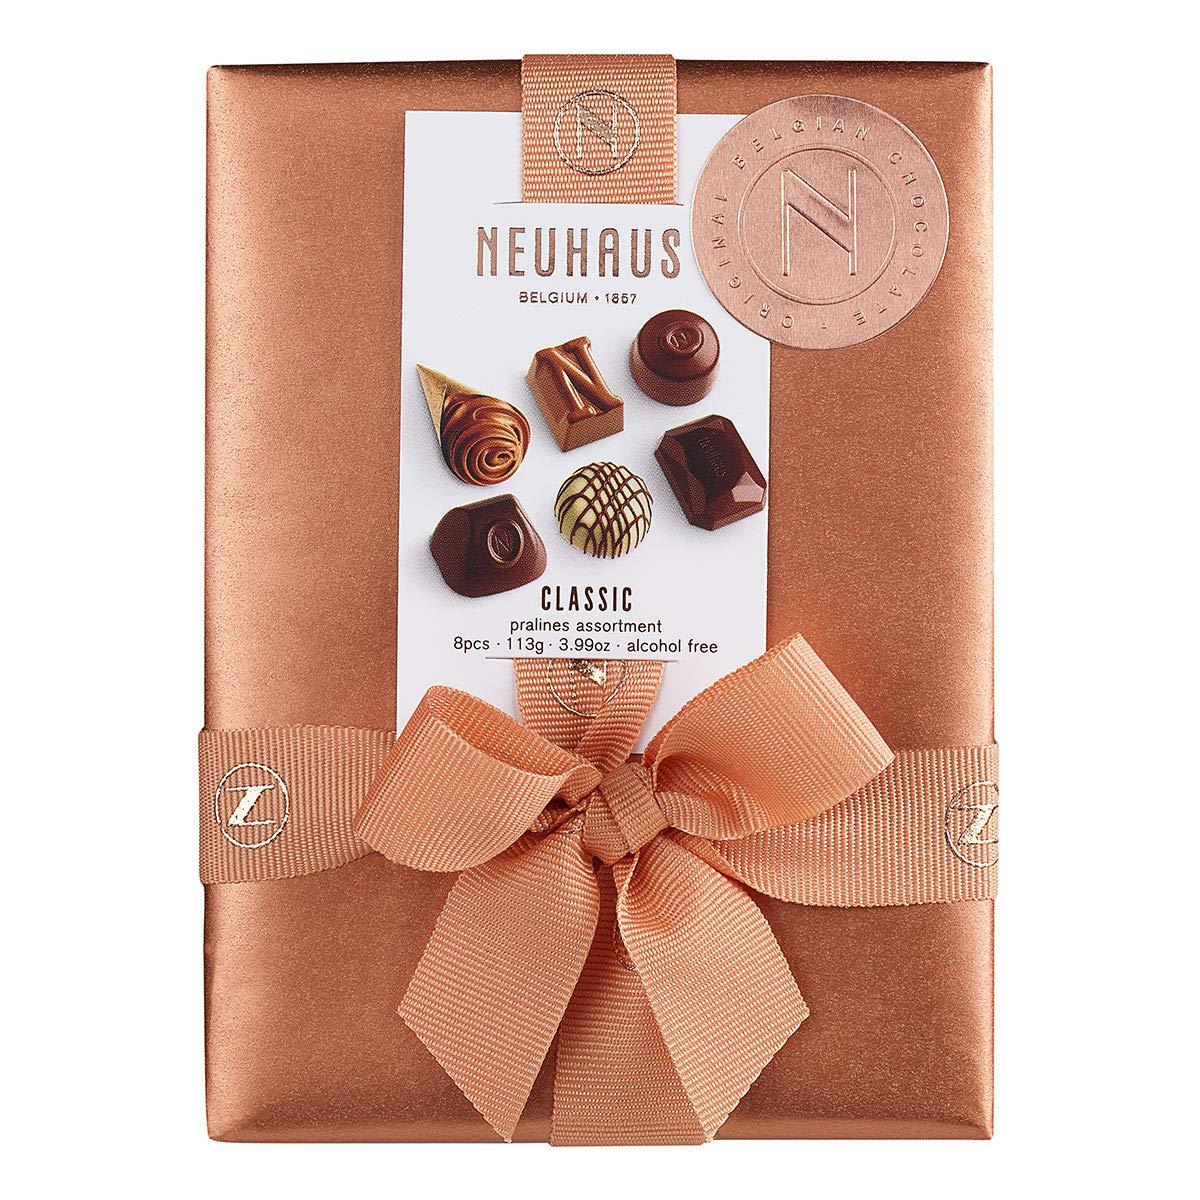 Neuhaus Belgian Chocolate Ballotin (8 pieces) - Gourmet Chocolate Gift Box - 1/4 lb by Neuhaus